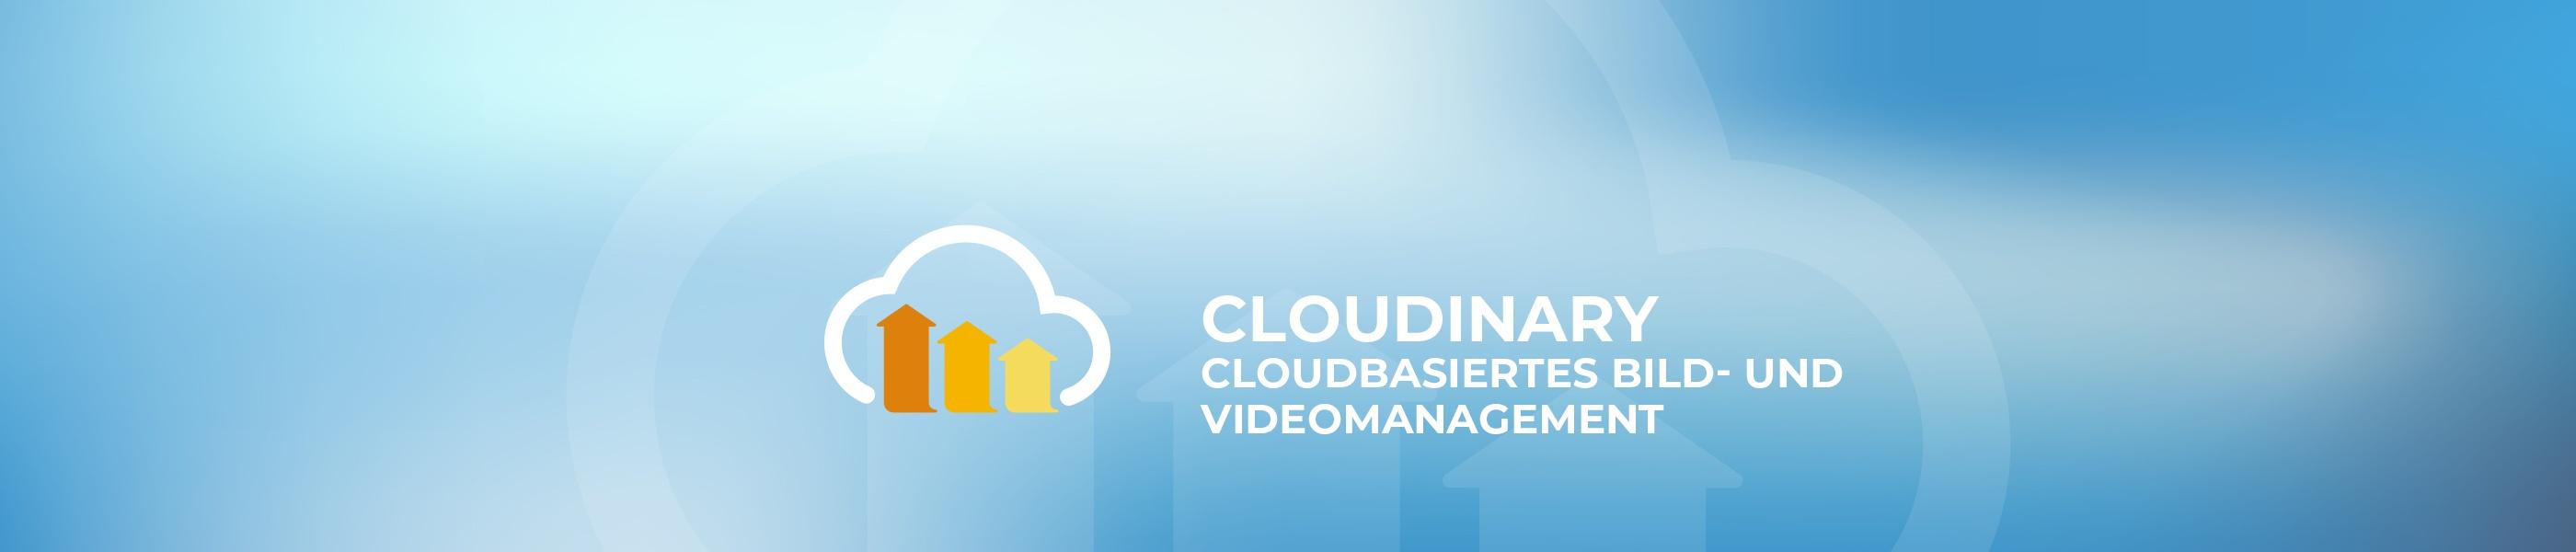 180720_Produkte-Cloudinary_DE.jpg